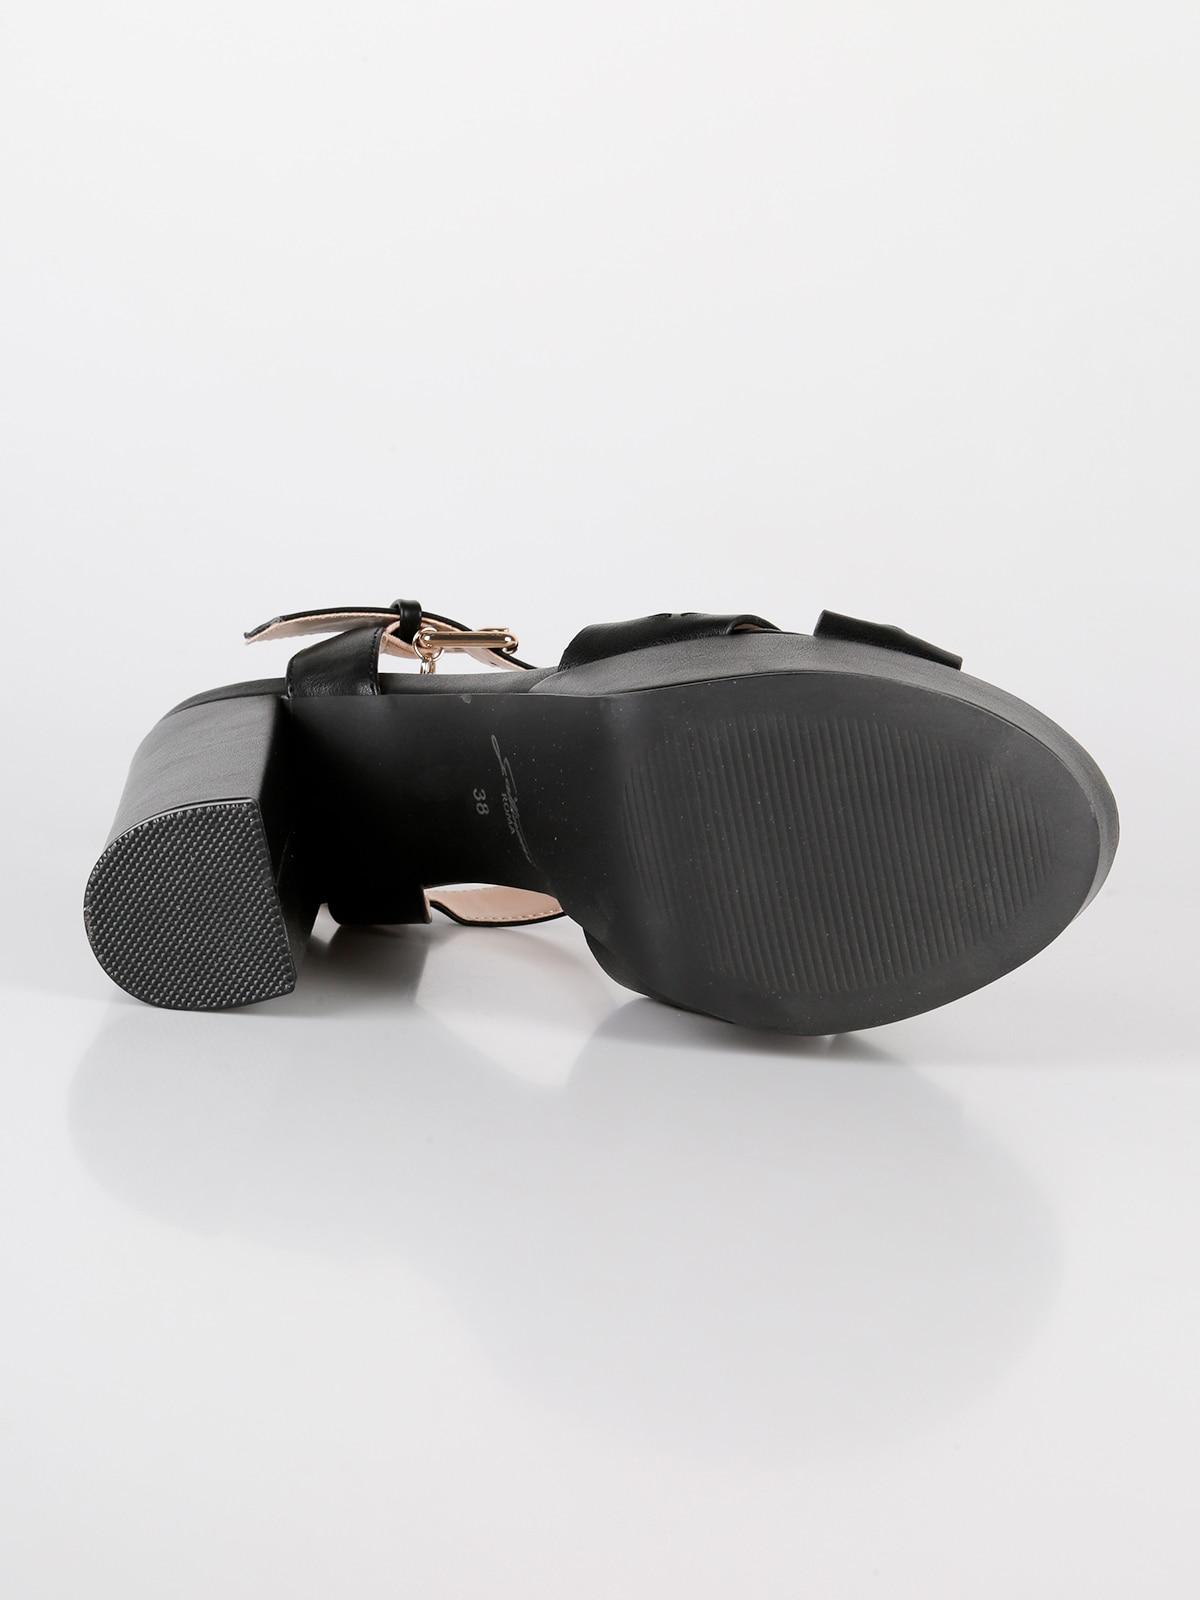 Гаттинони сандалии на блочном каблуке и платформе ламинированное серебро - 6